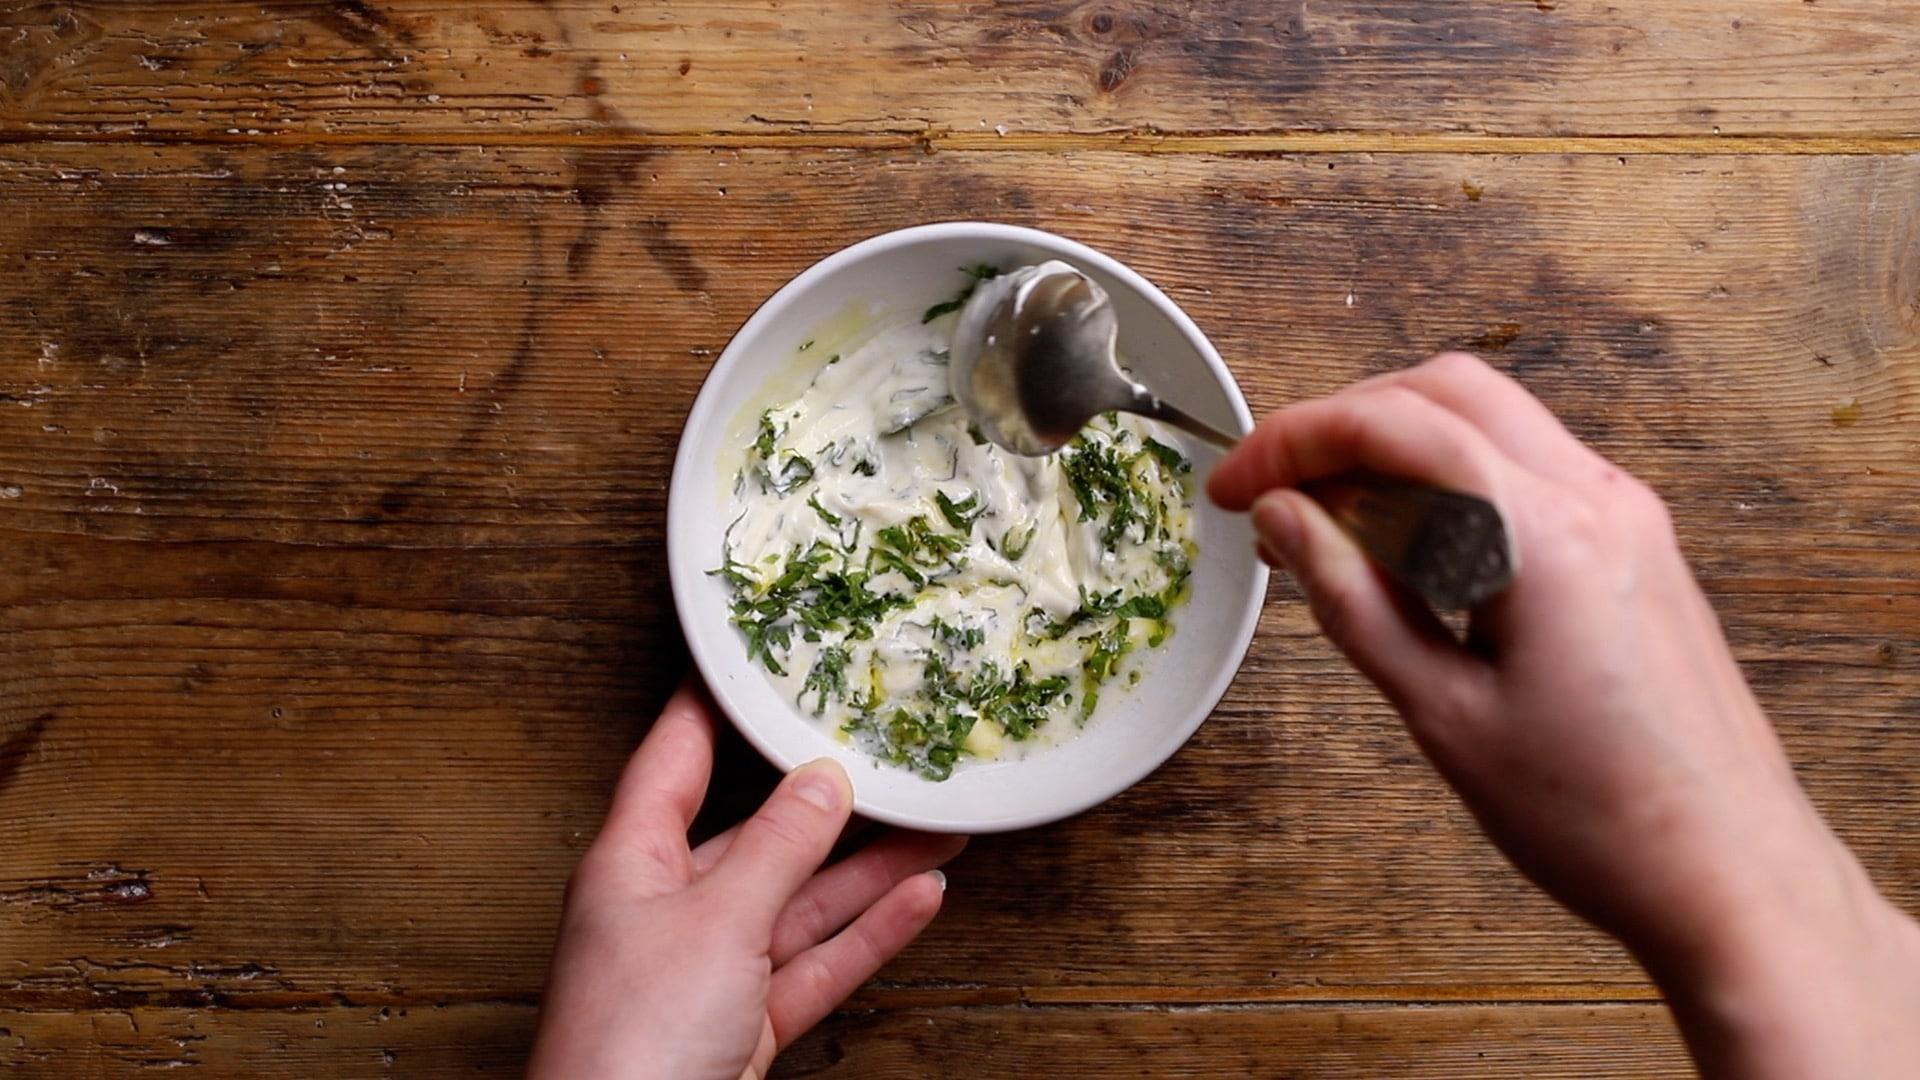 mix together yogurt, lemon juice, garlic granules and mint